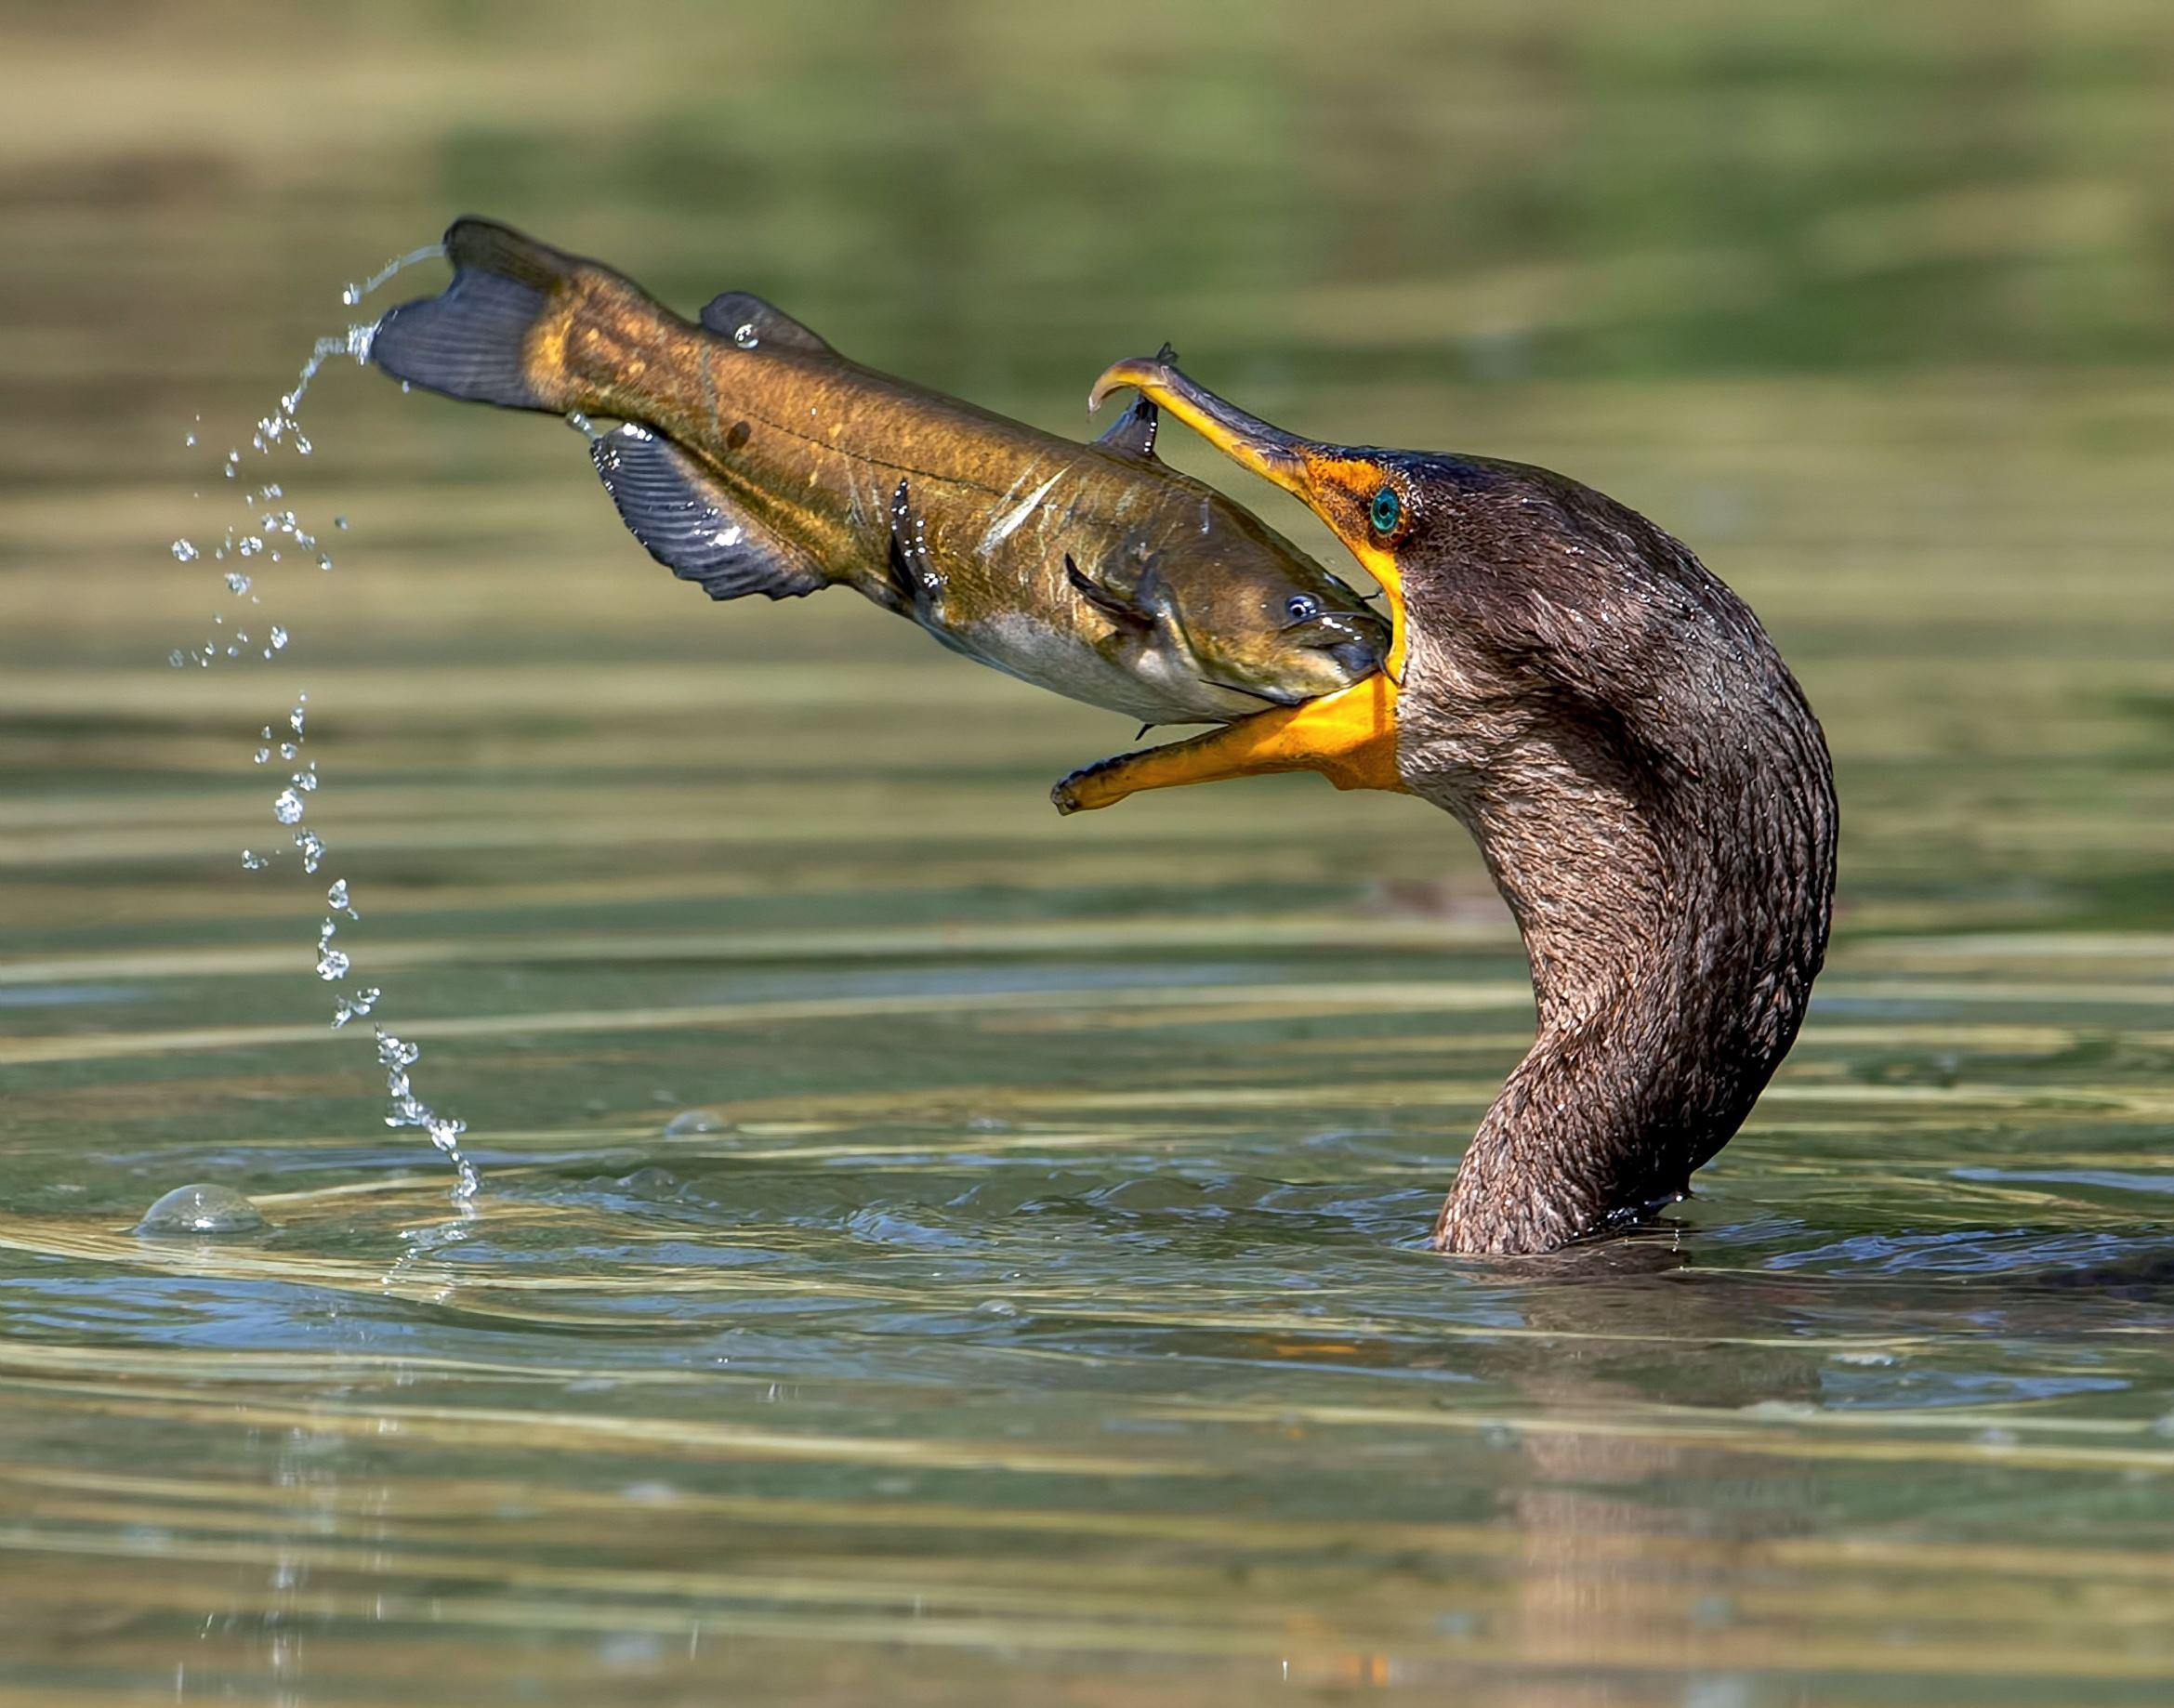 Слайд 25 из 67: Cormorant eats a fish in Fullerton Arboretum, California, USA - May 2016 Cormorant catching and eating the catfish